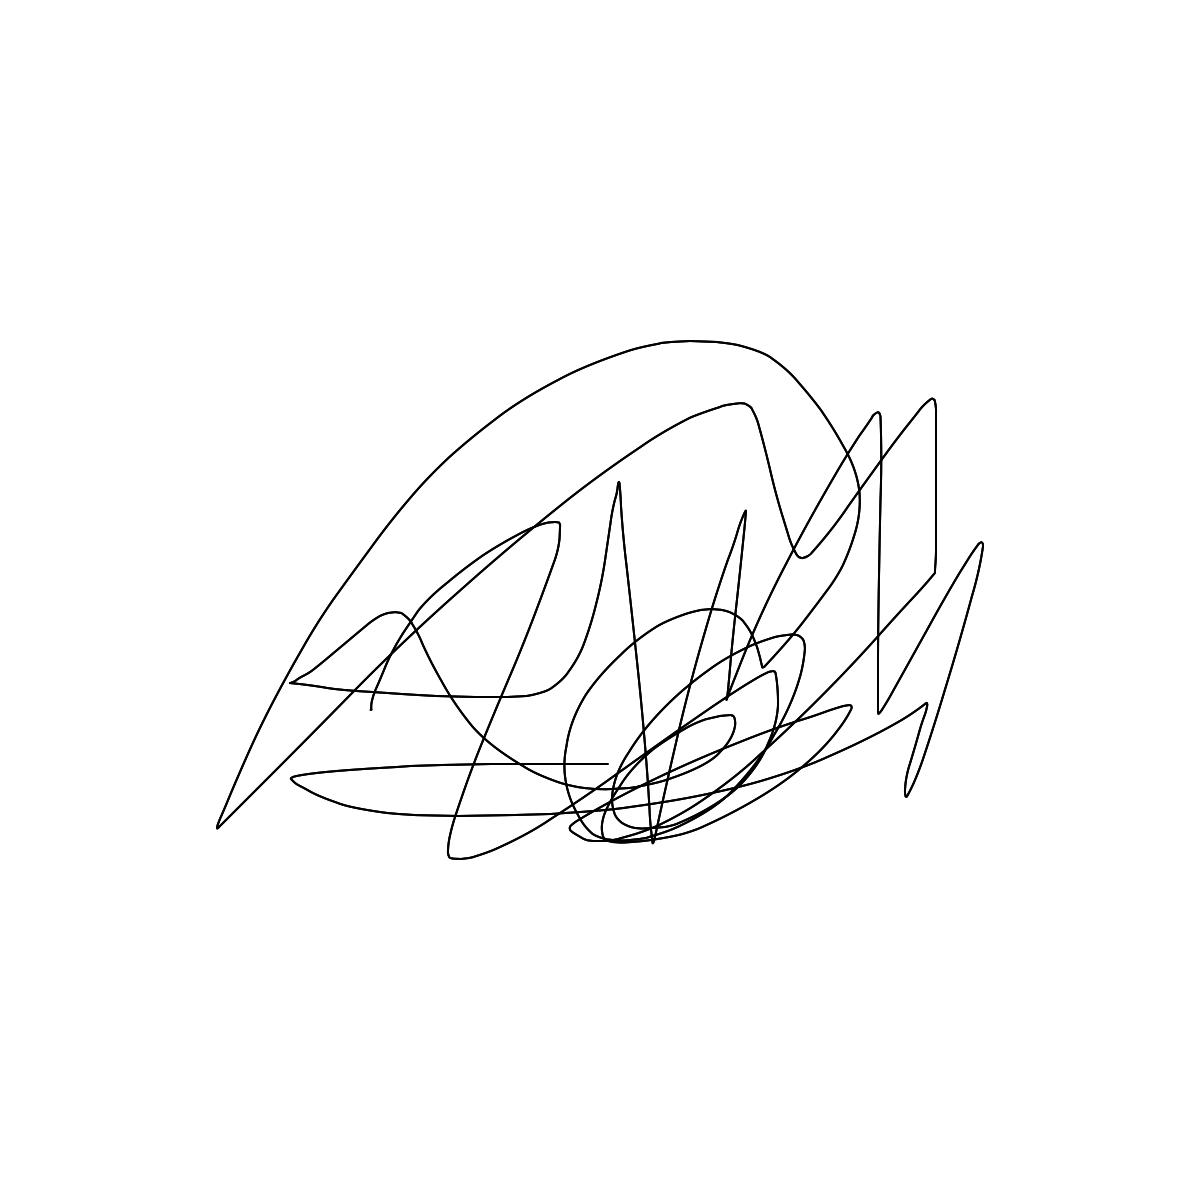 BAAAM drawing#15400 lat:33.6969261169433600lng: -100.1074295043945300